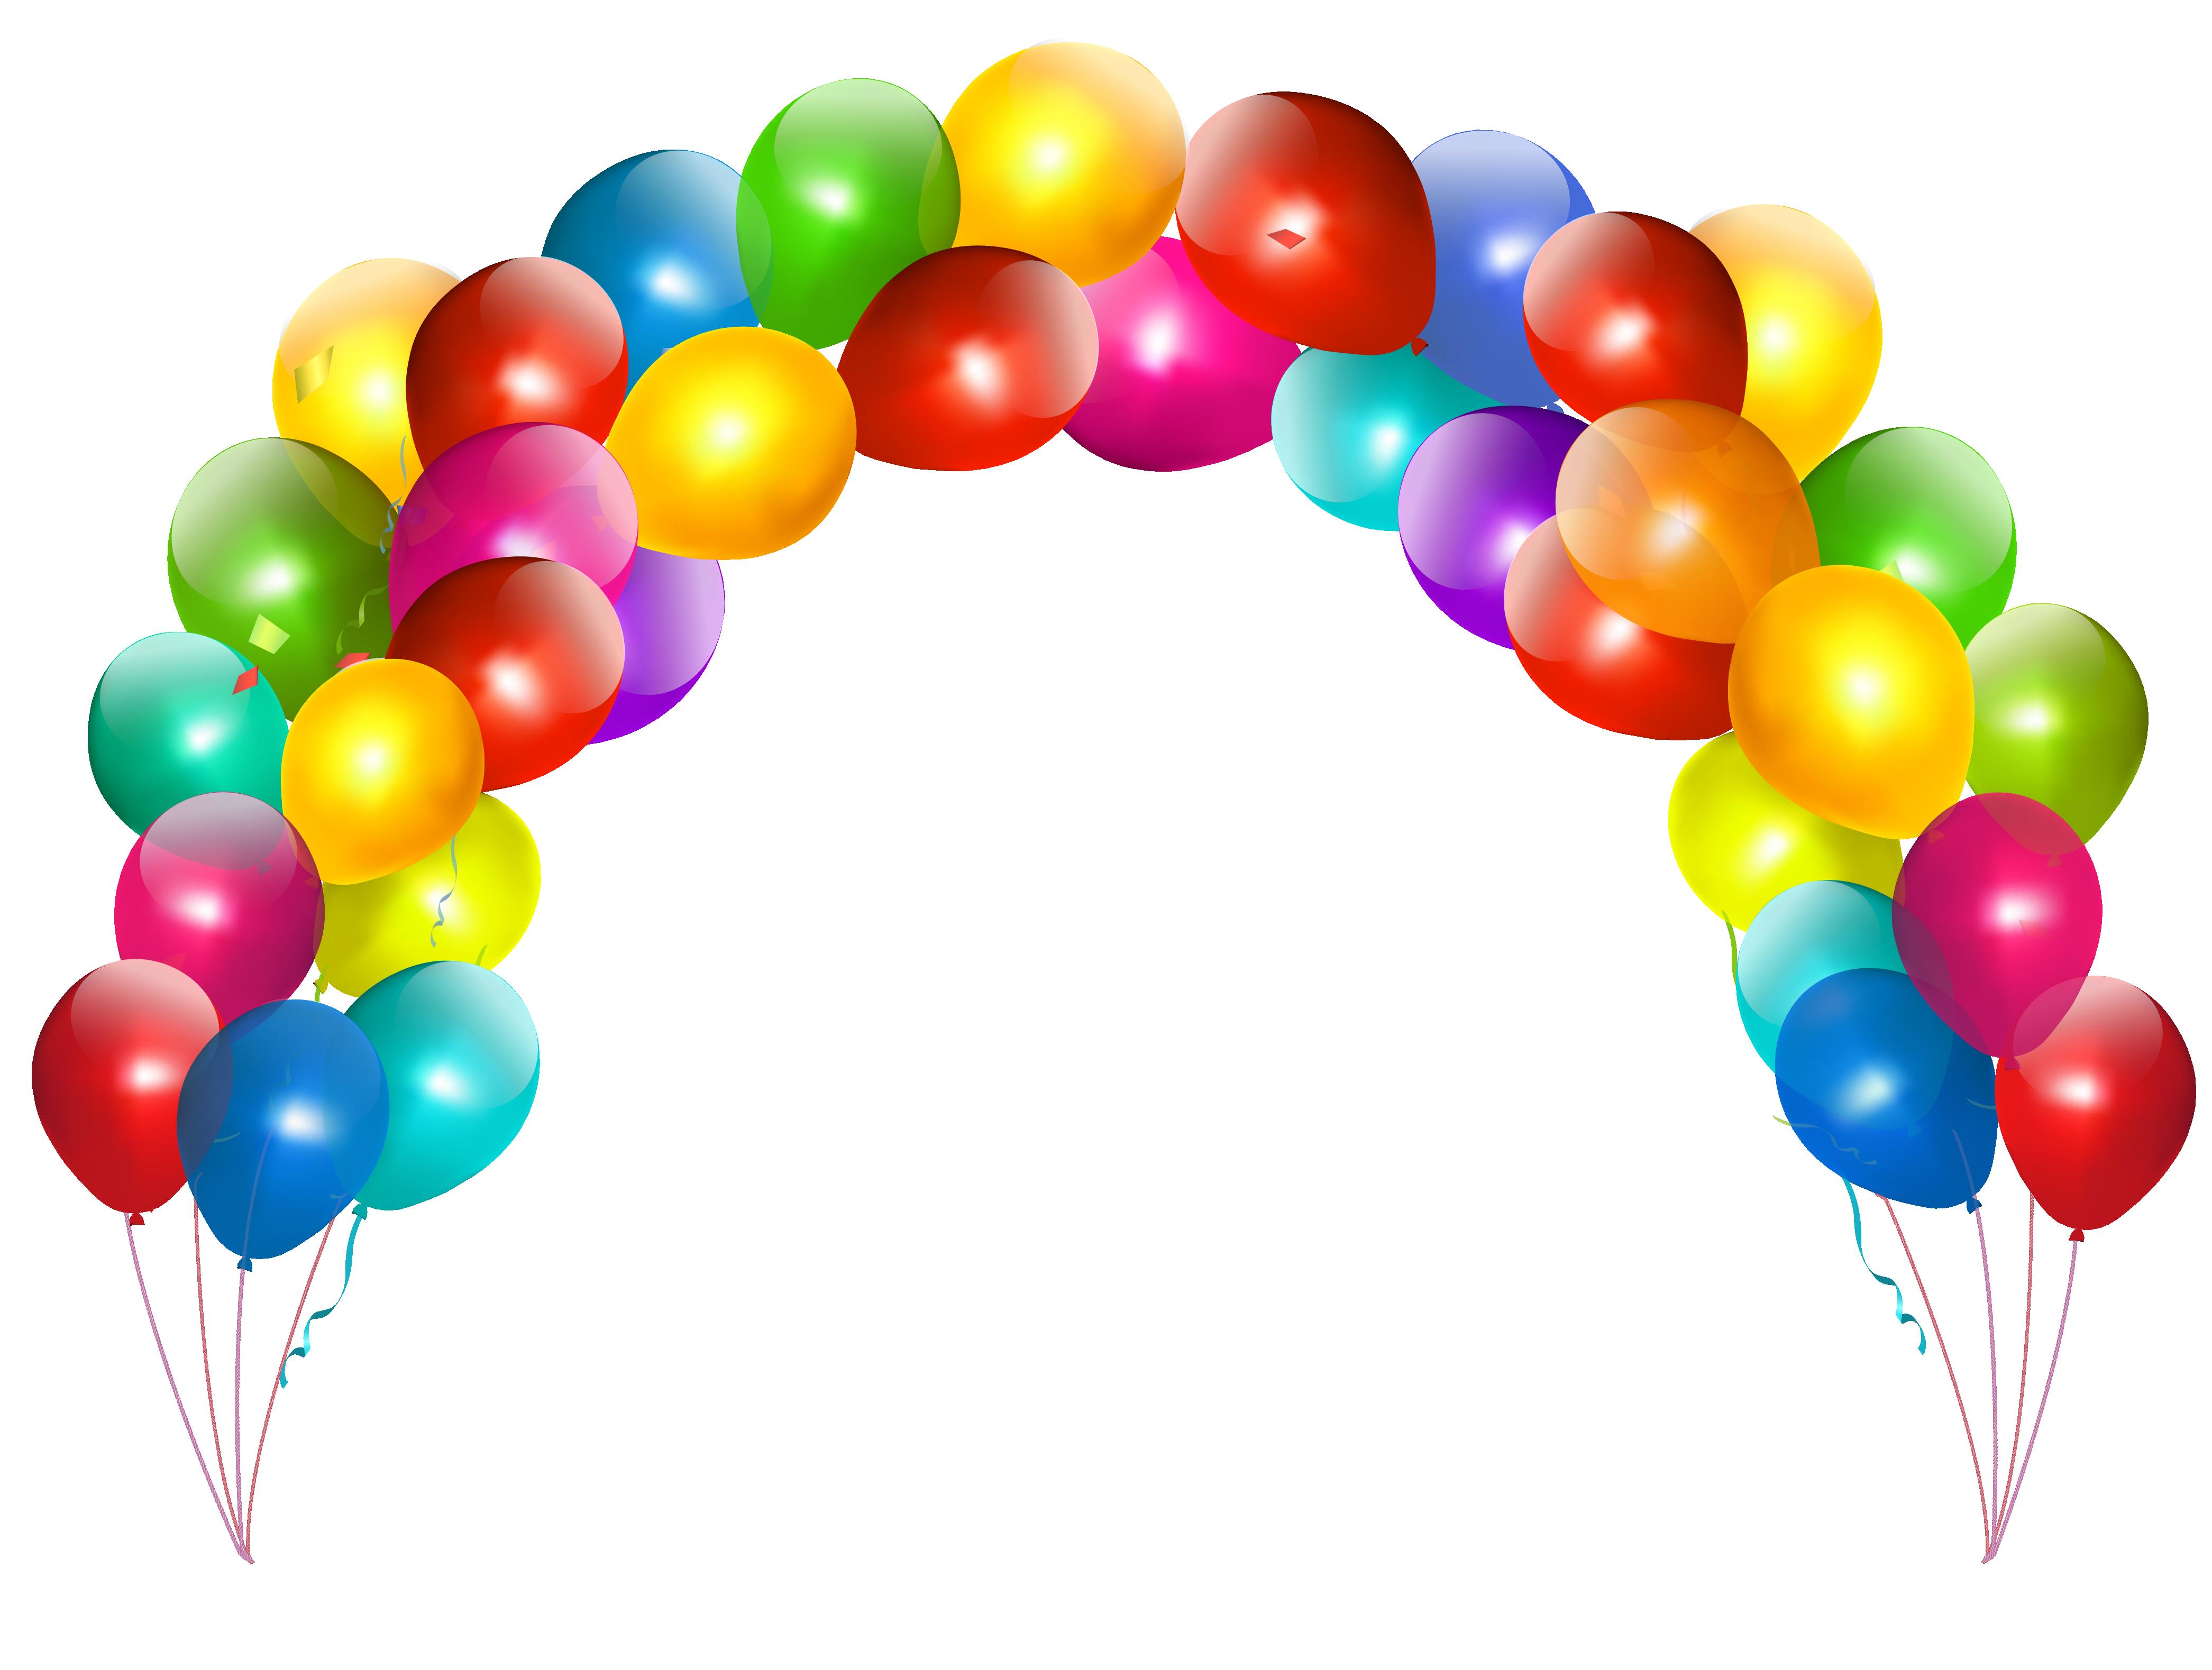 Balloon Png Images - 1000 pics-Balloon Png Images - 1000 pics-11